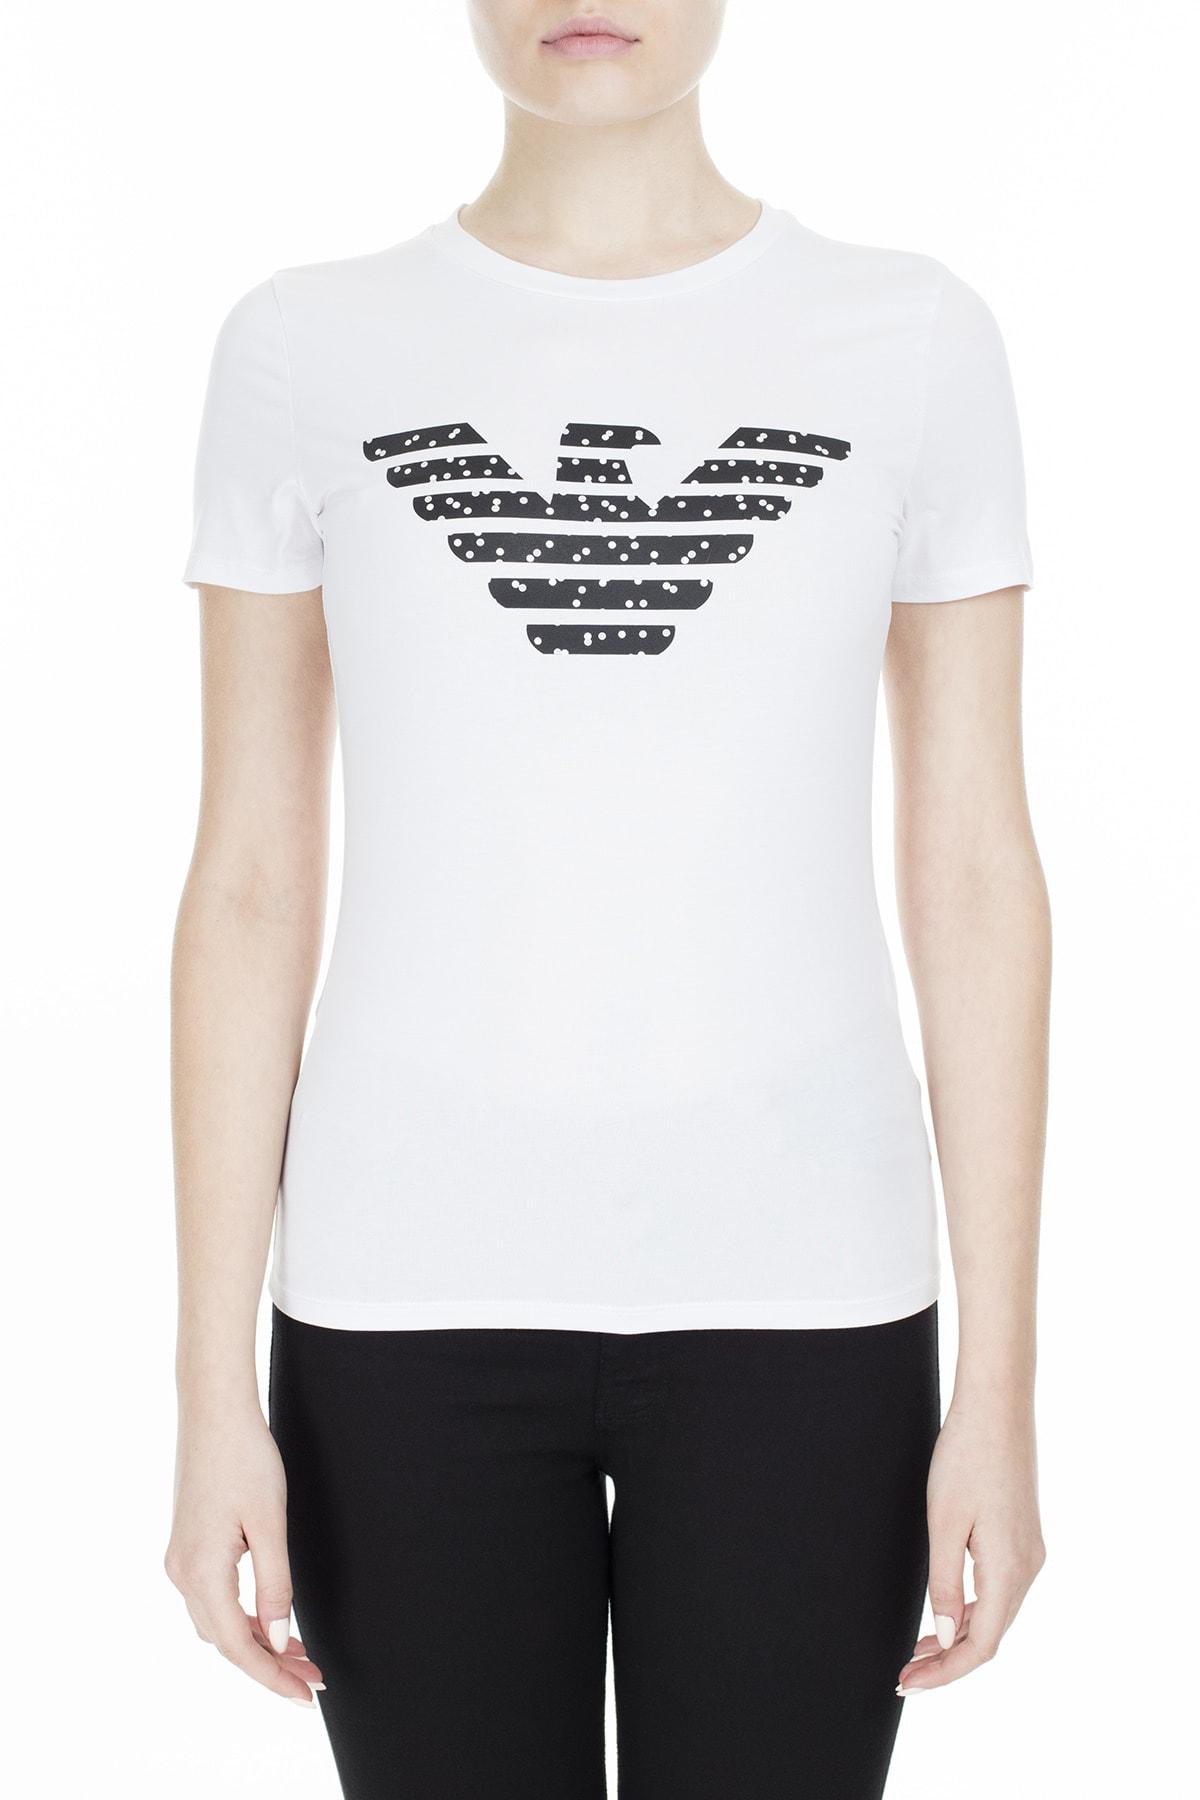 Emporio Armani T Shirt Kadın T Shirt S 6G2T7N 2J07Z 0100 S 6G2T7N 2J07Z 0100 0